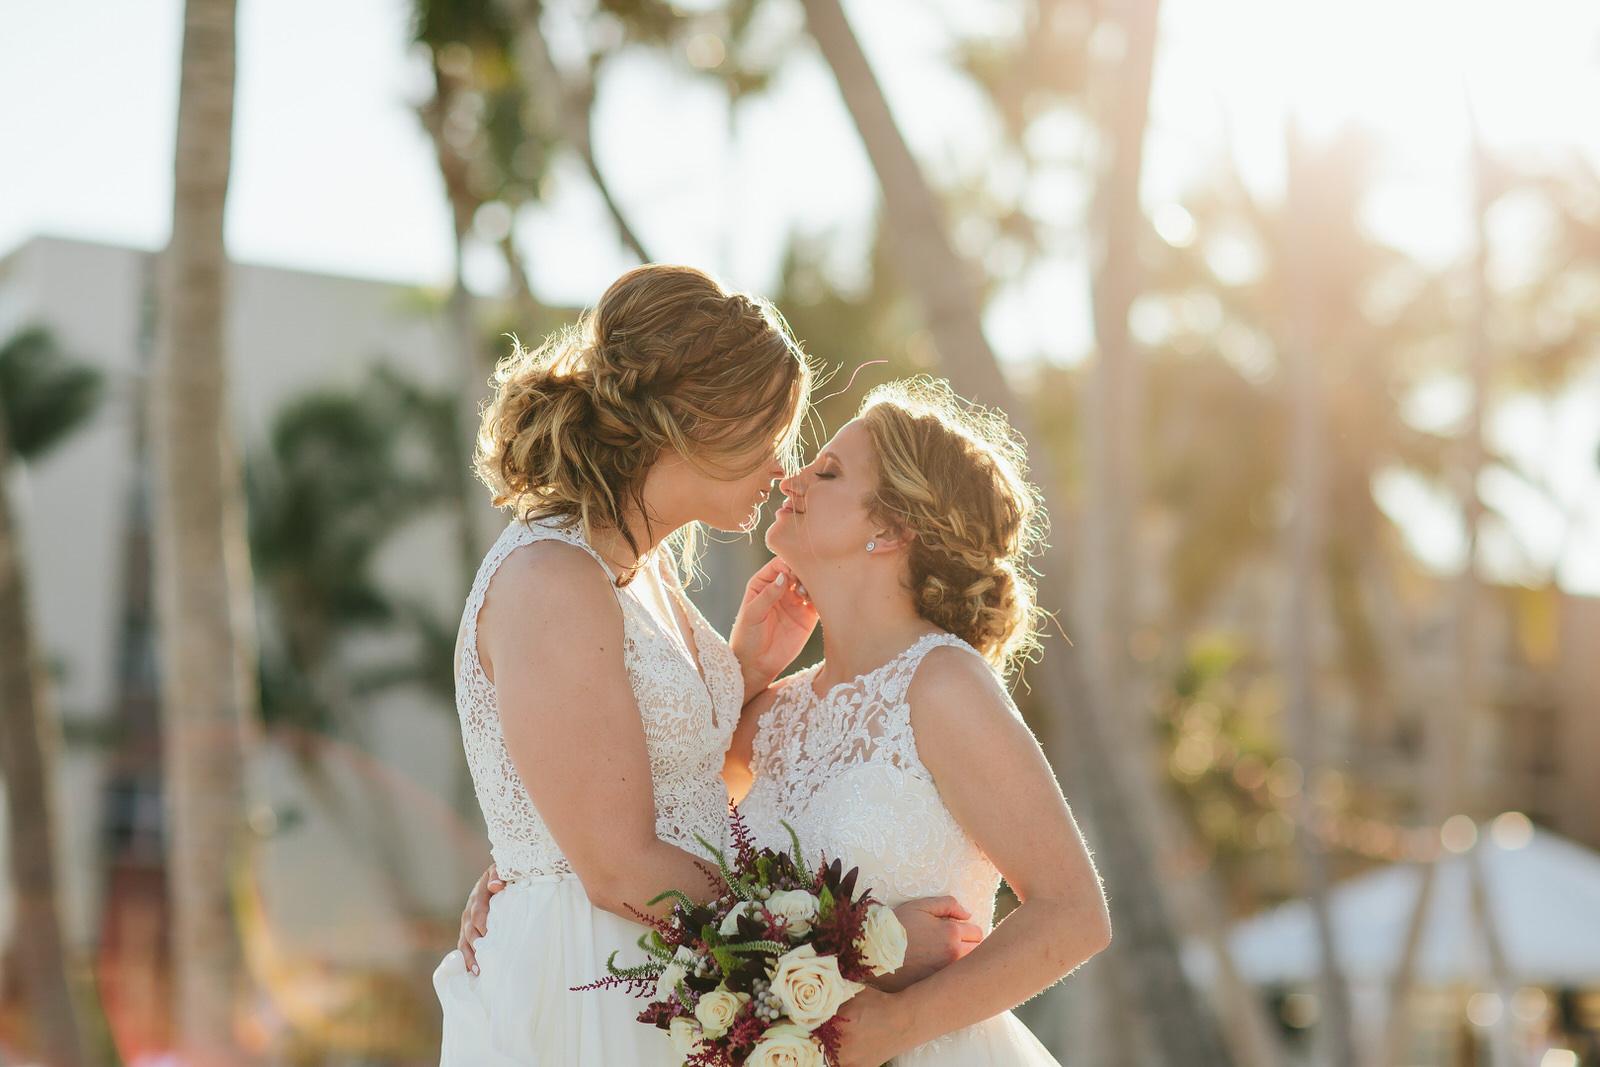 LGBTQ+ couple had a destination wedding at Amara Cay Resort in Islamorada, FL. Couple is kissing during golden hour on the beach.